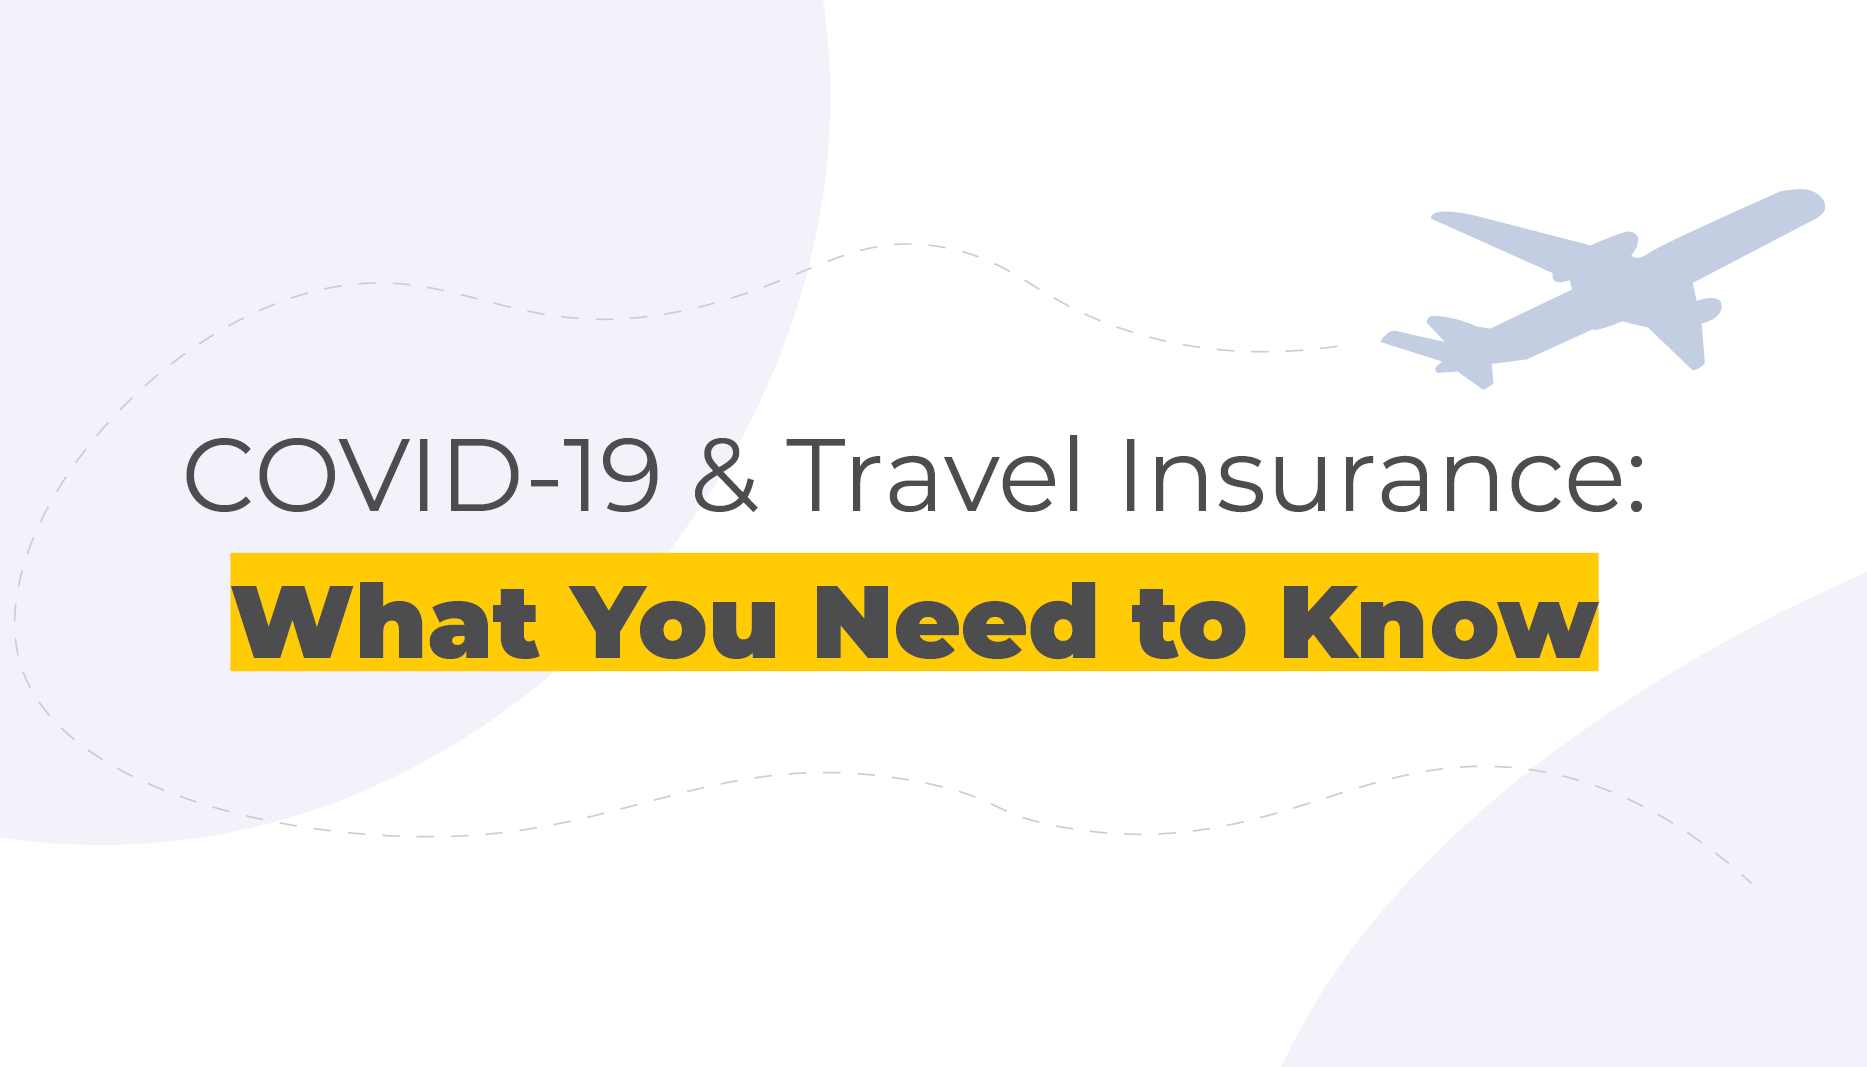 COVID-19 & Travel Insurance